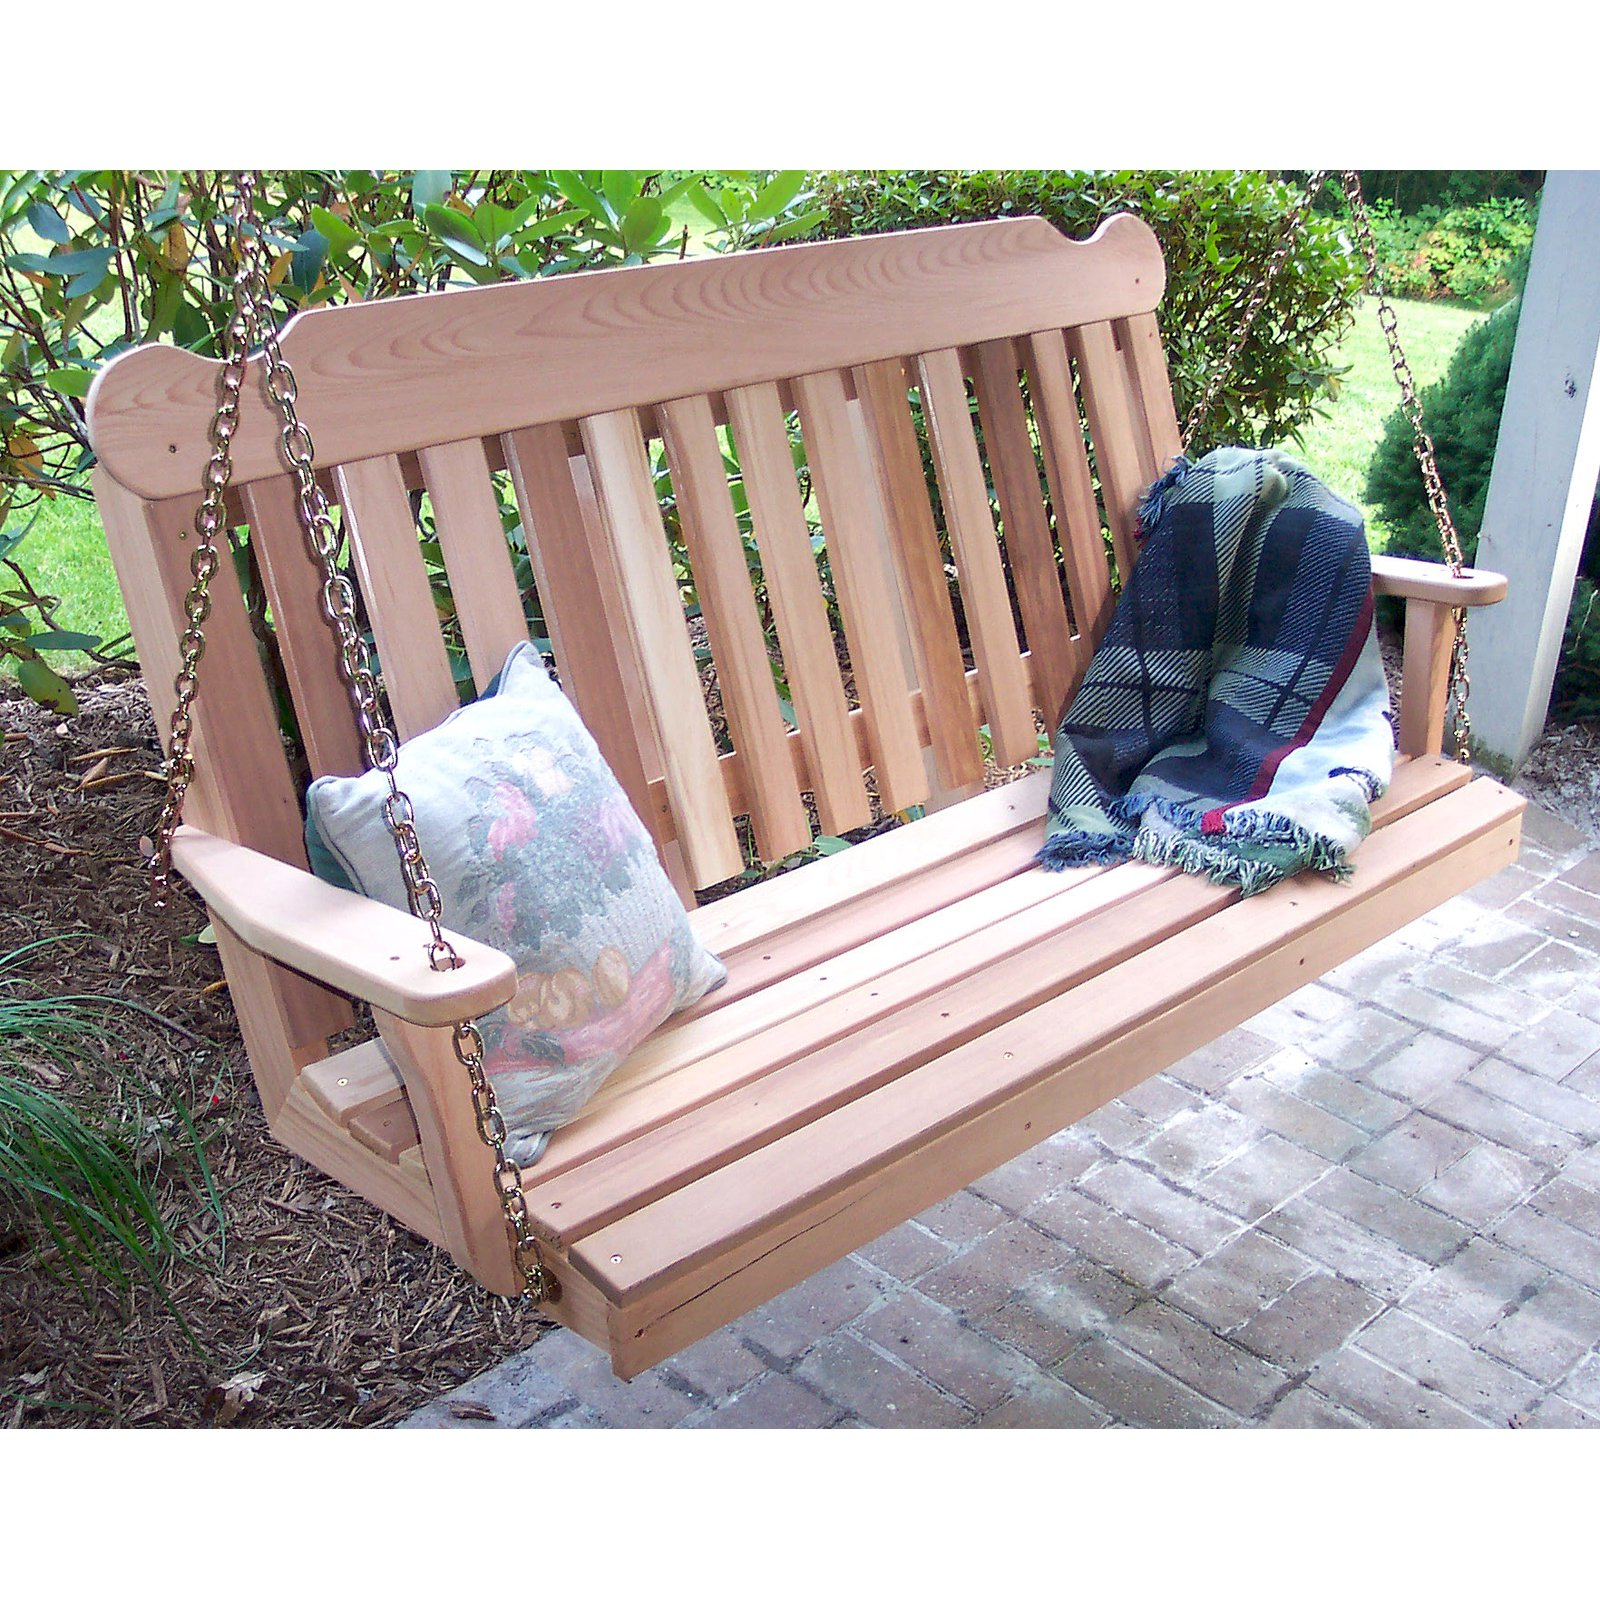 Creekvine Designs Classic Cedar Porch Swing by Porch Swings